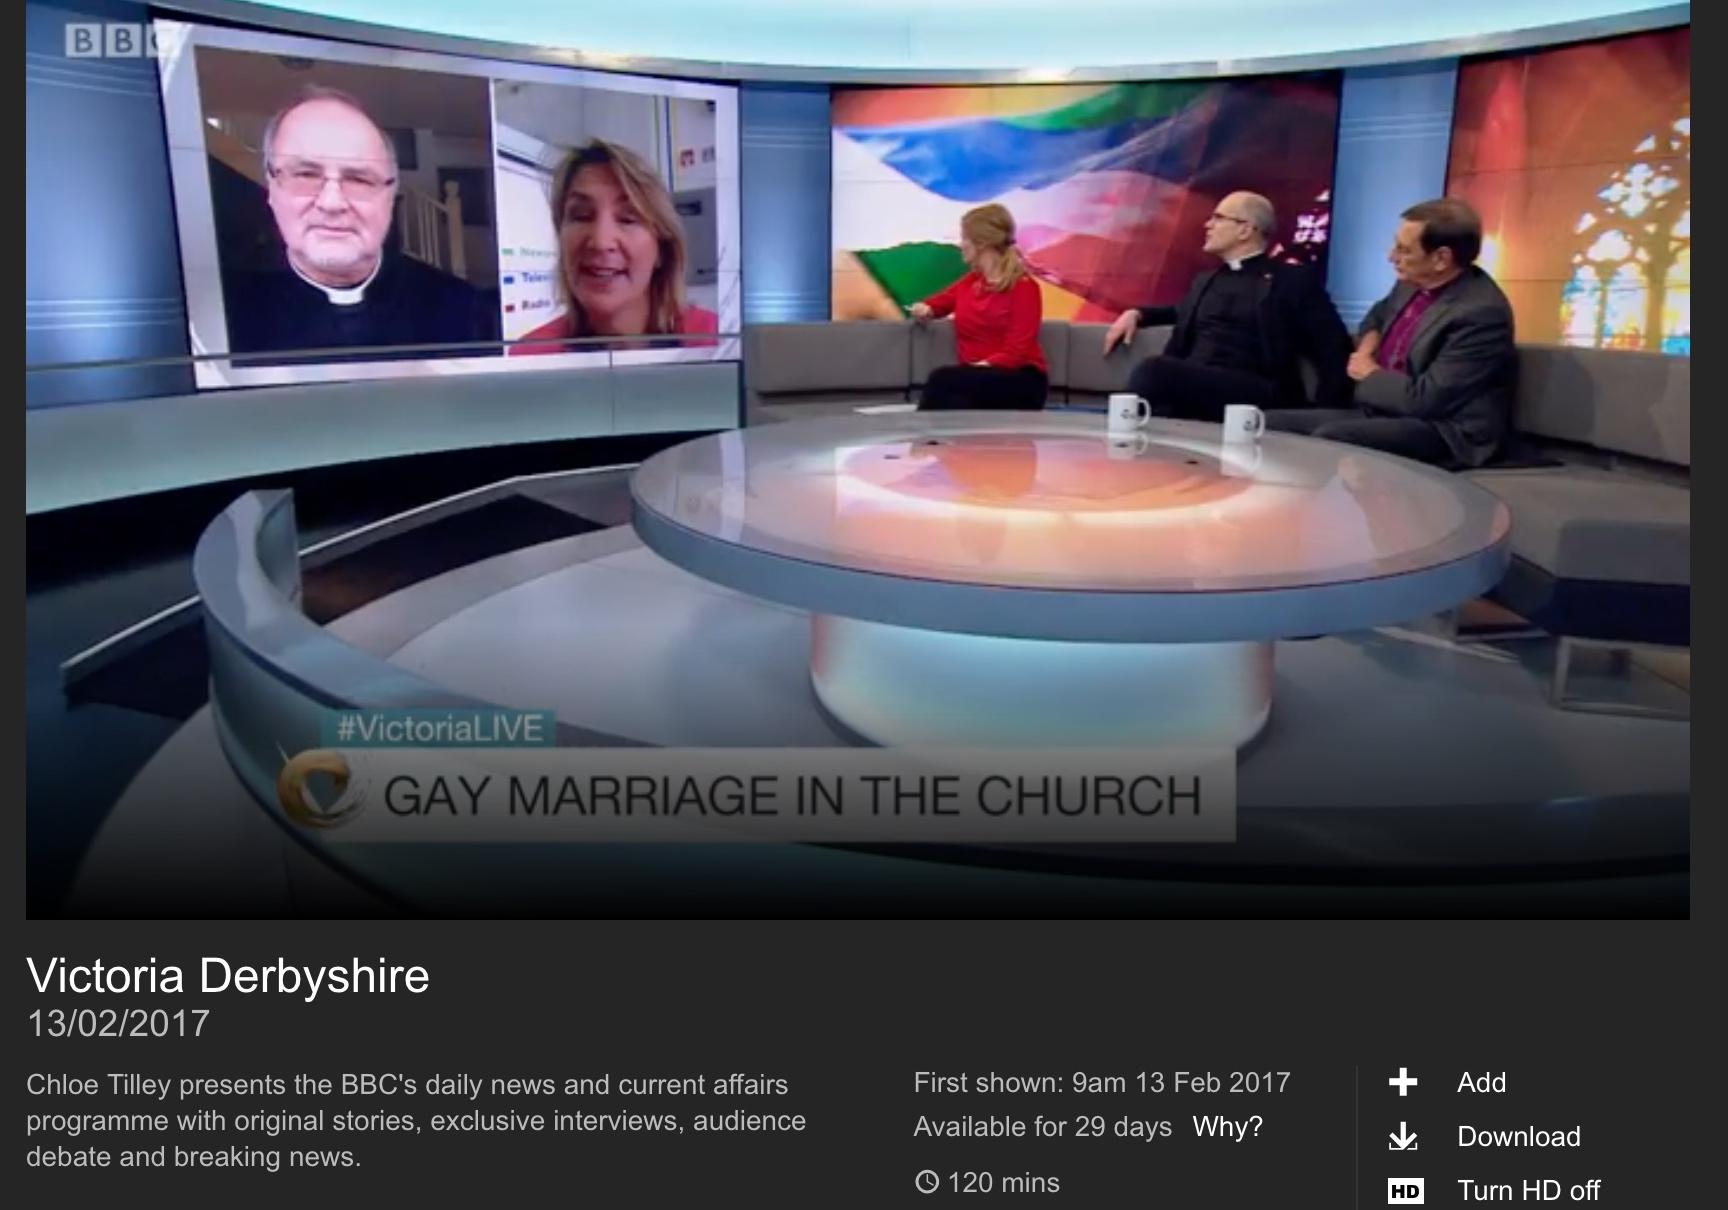 Bbc homosexual marriage video